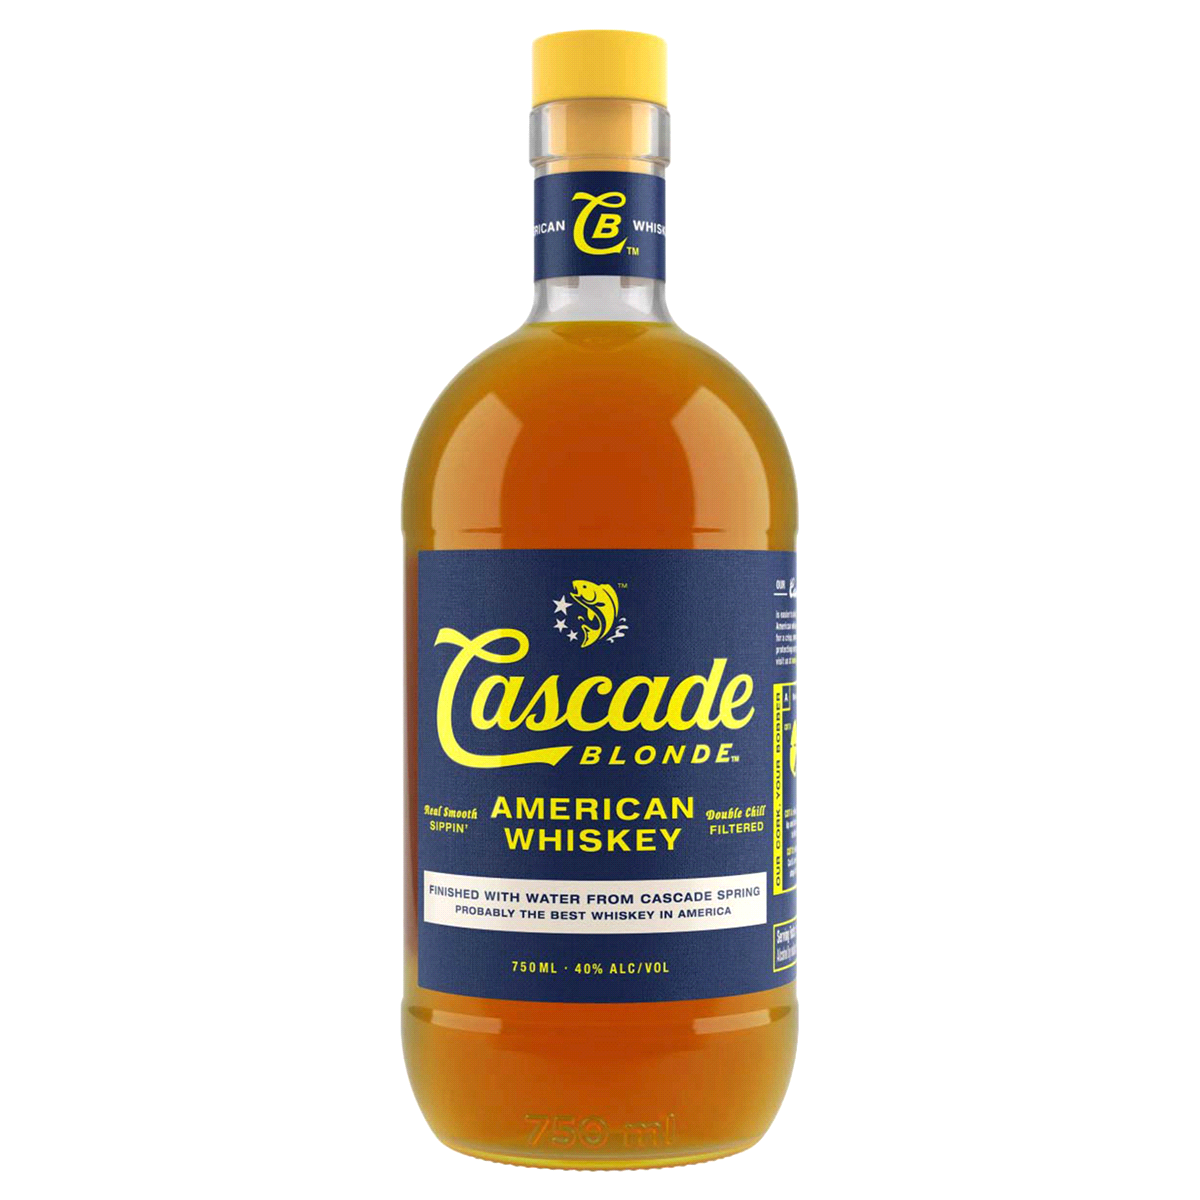 Cascade Blonde   750 ML